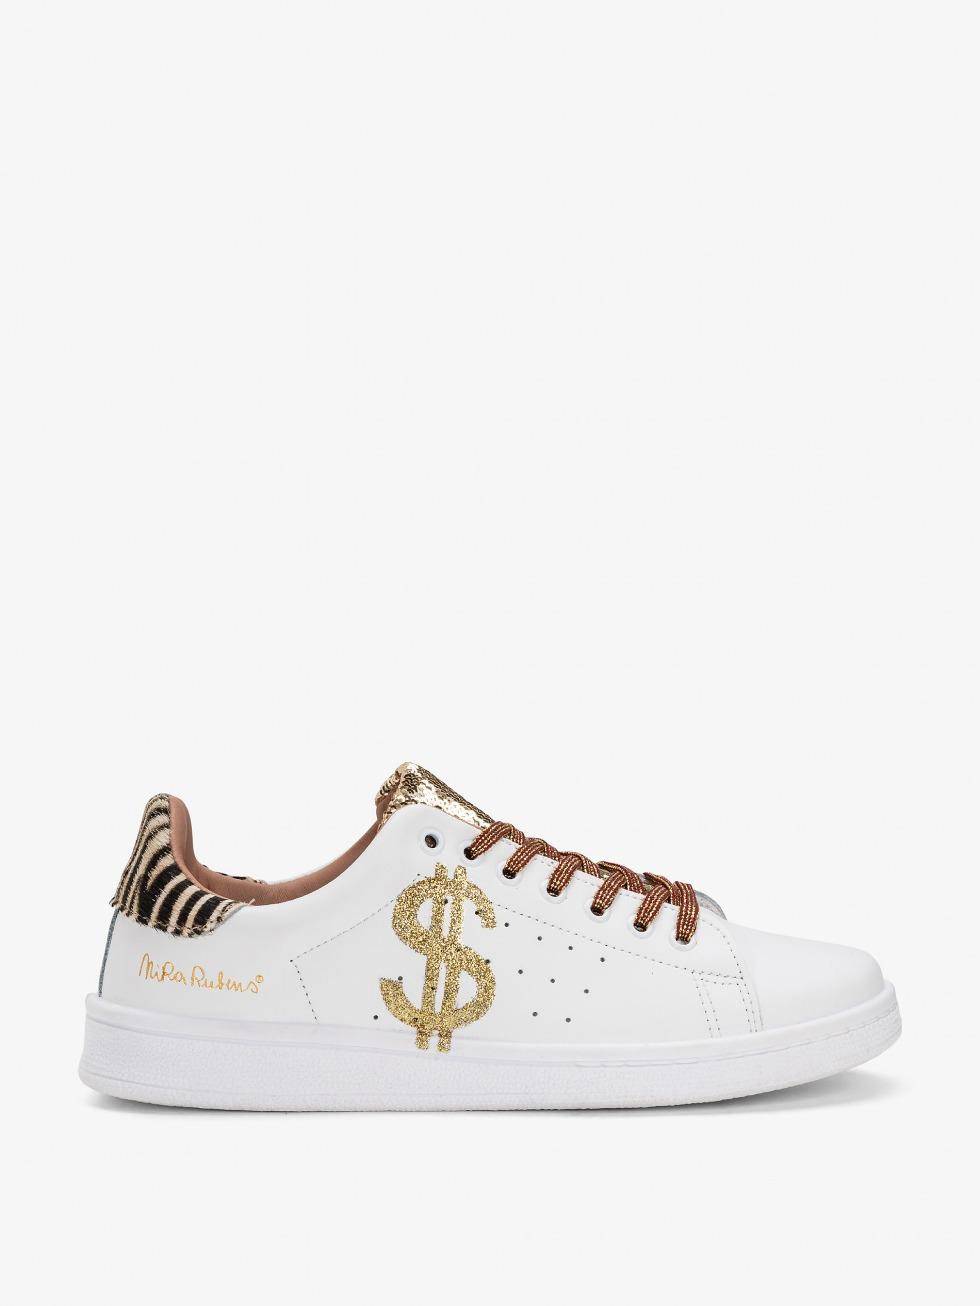 Daiquiri Sparkle Mini Zebrina Sneakers - Gold Dollar